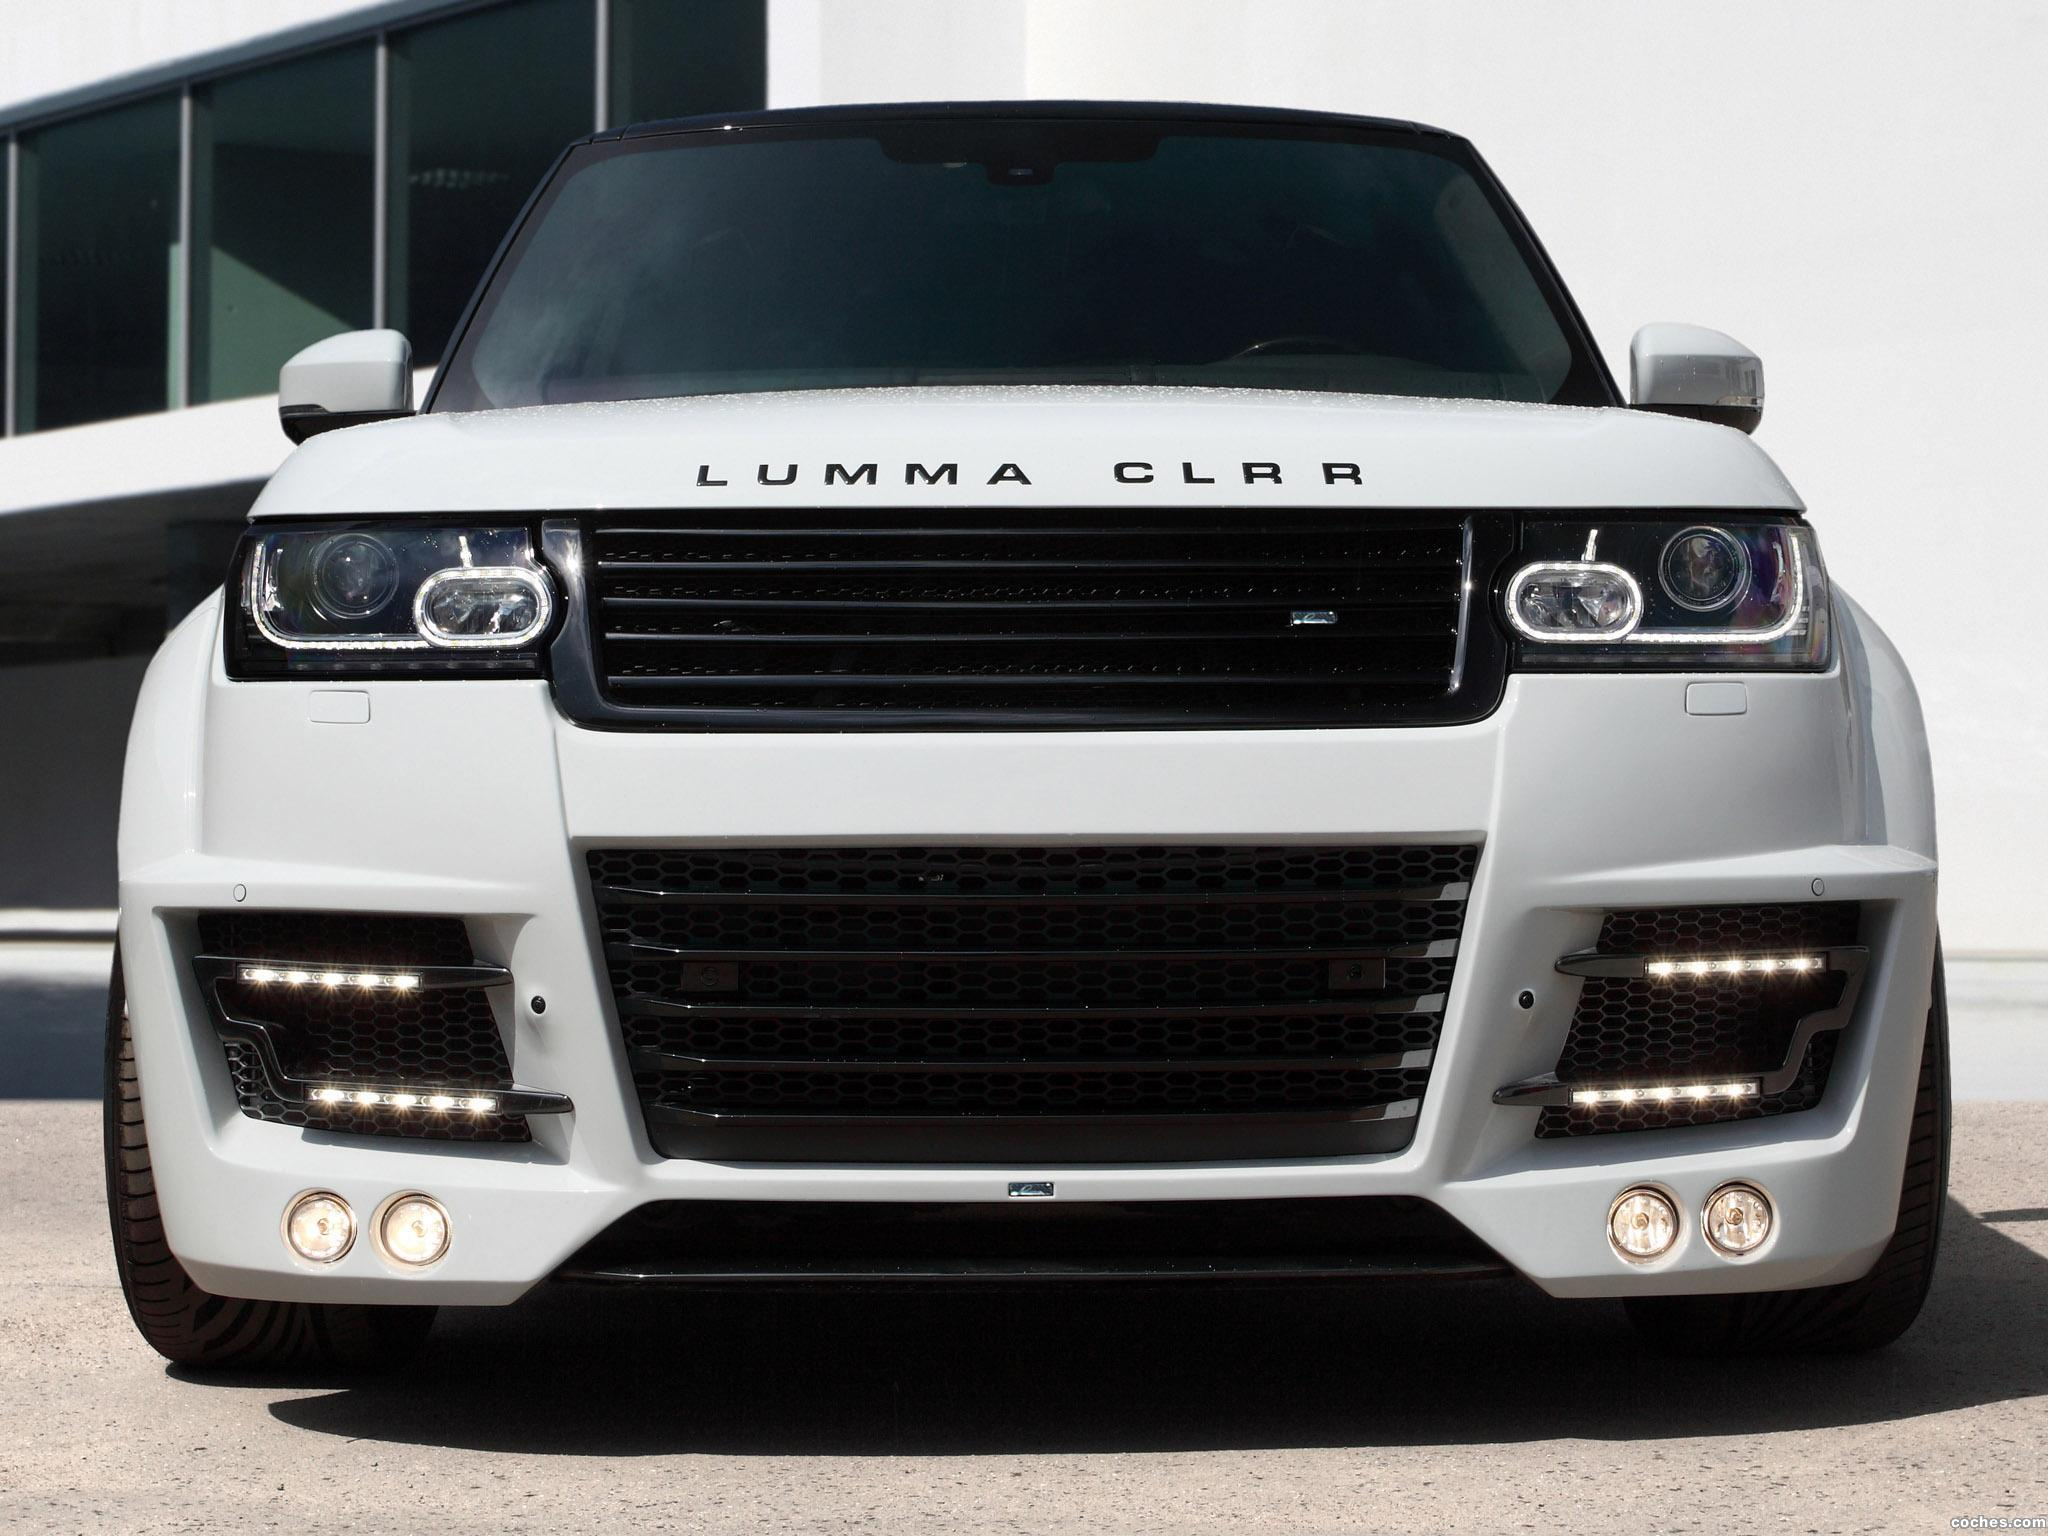 Foto 2 de Topcar Land Rover Range Rover Lumma CLR R L405 2013